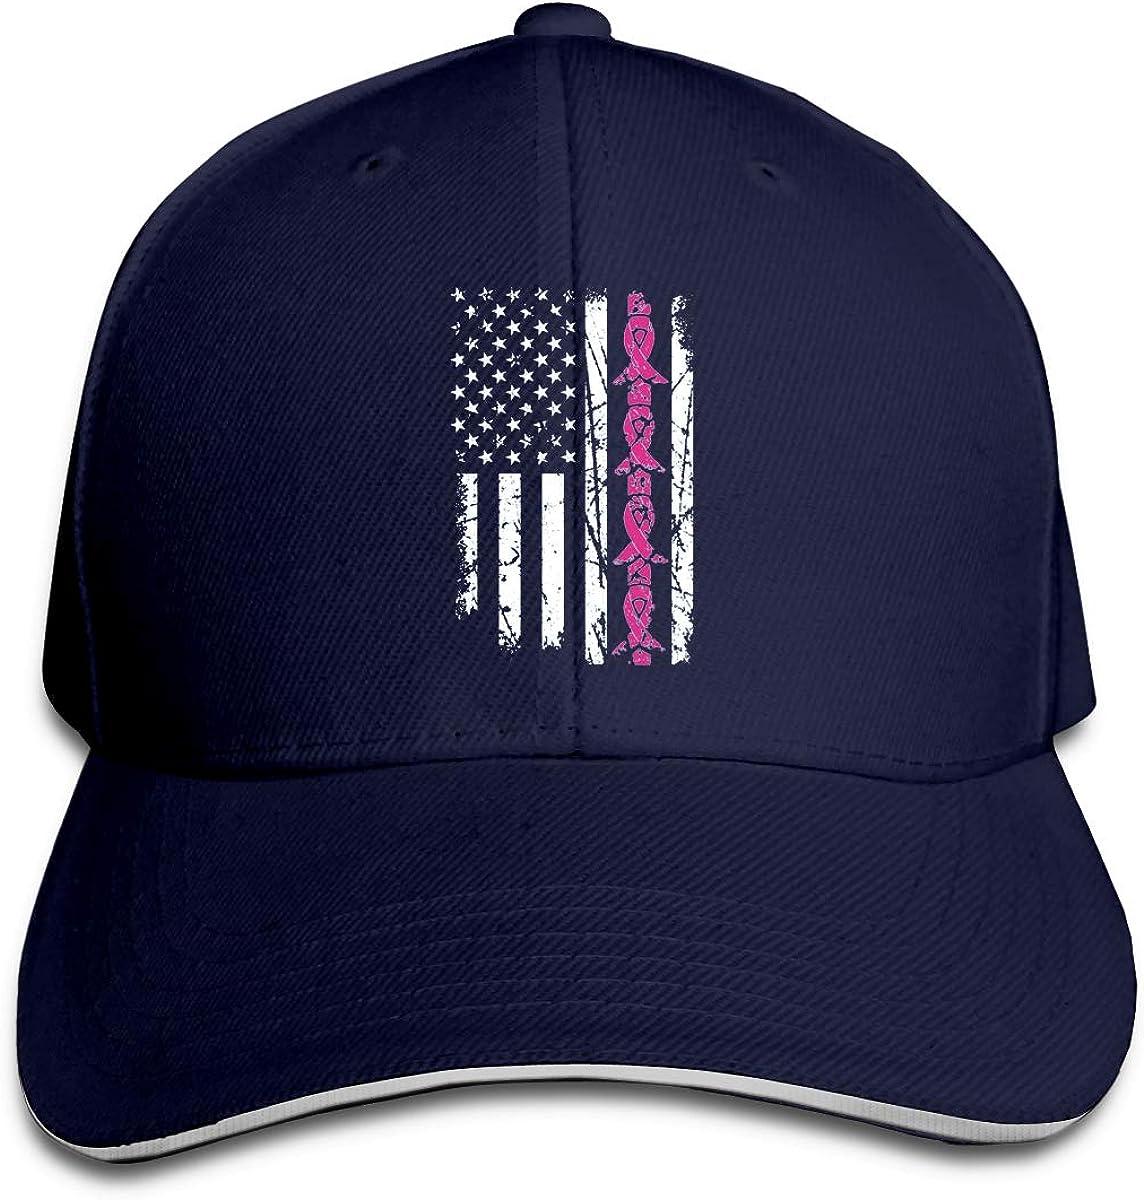 Breast Cancer Awareness Pink Ribbon American Flag Hat Baseball Cap Duck Tongue Cap Sunhat Fashion Cap